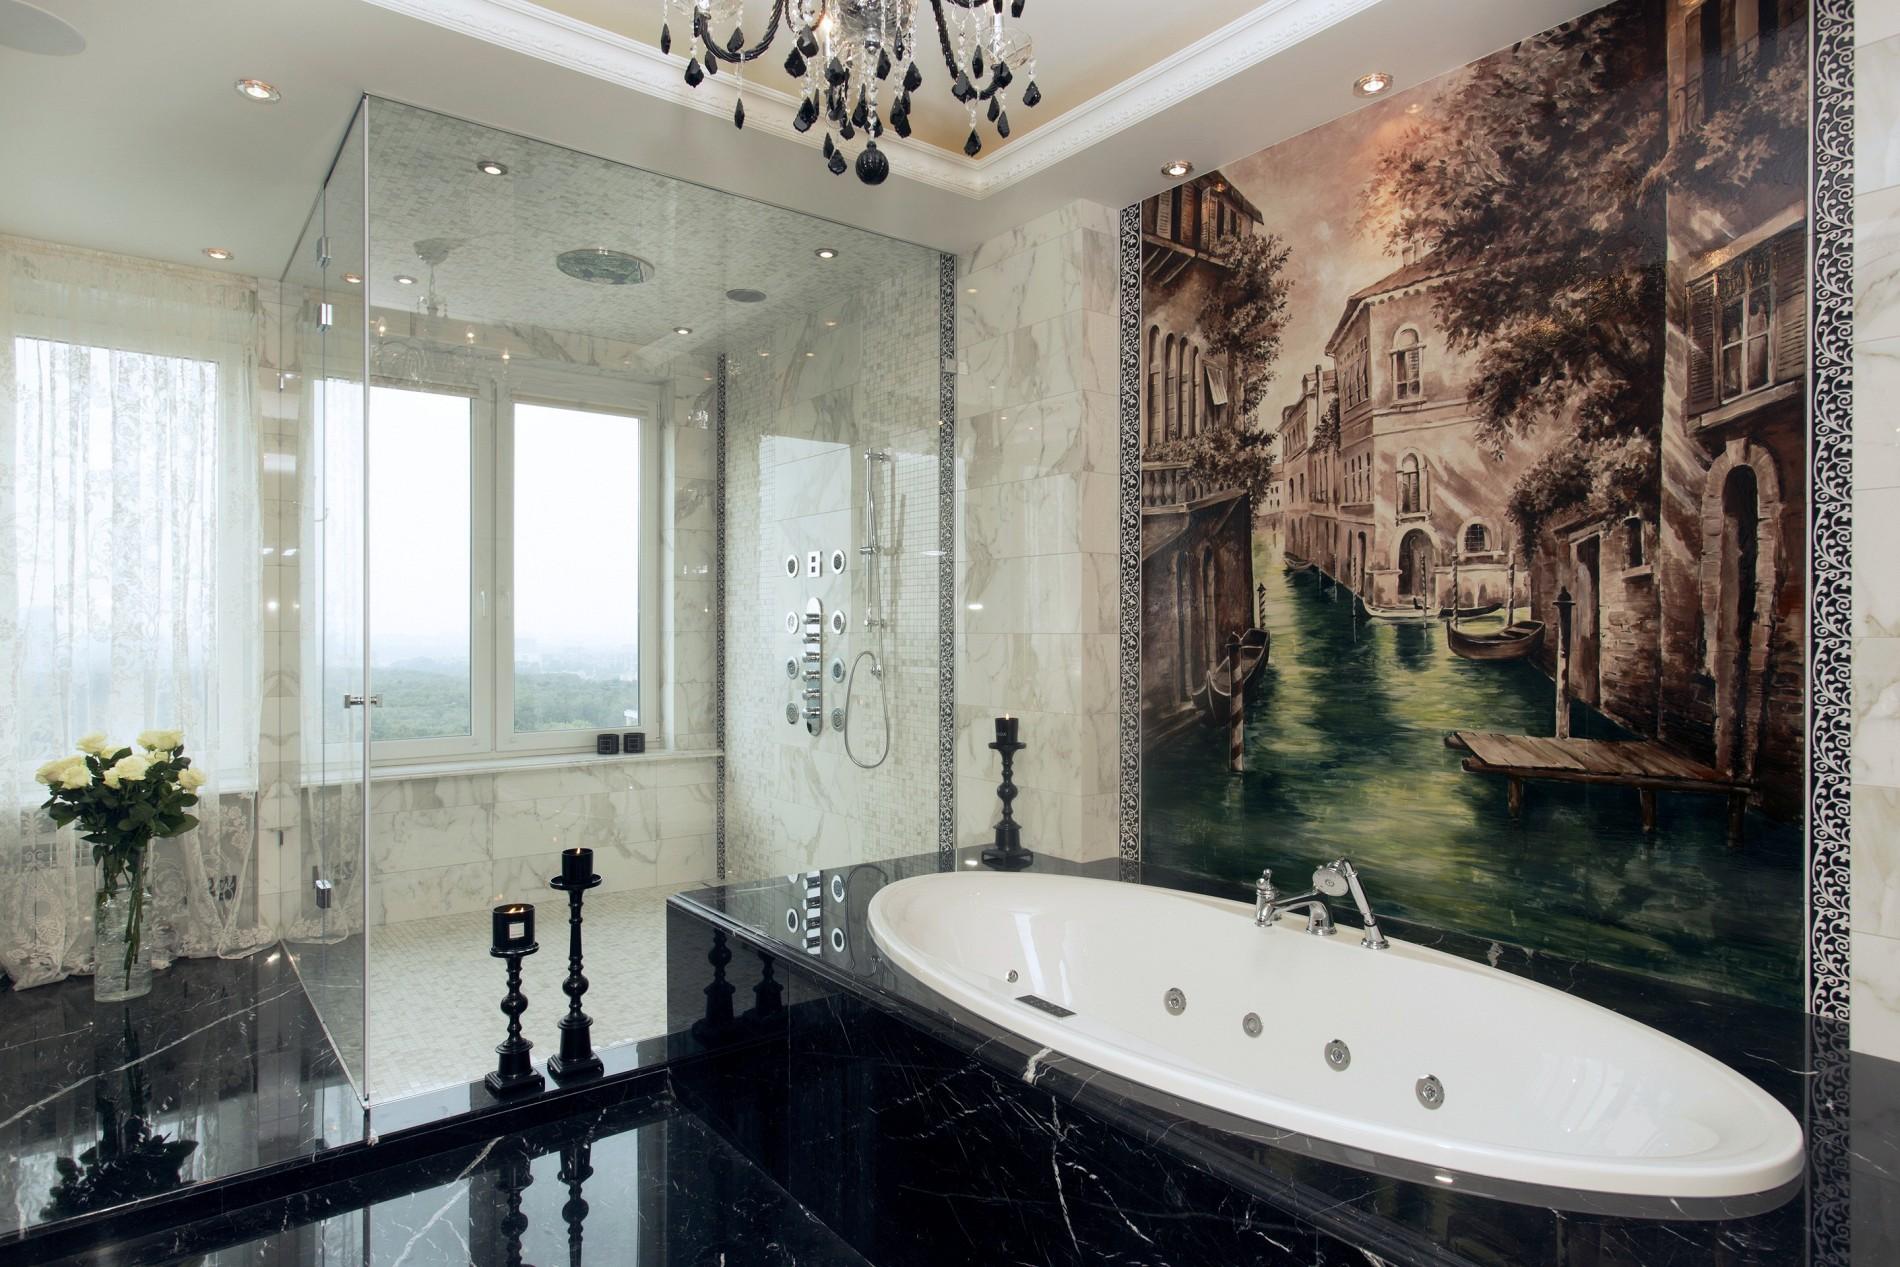 Nero Marquina мрамор в шикарном интерьере ванной